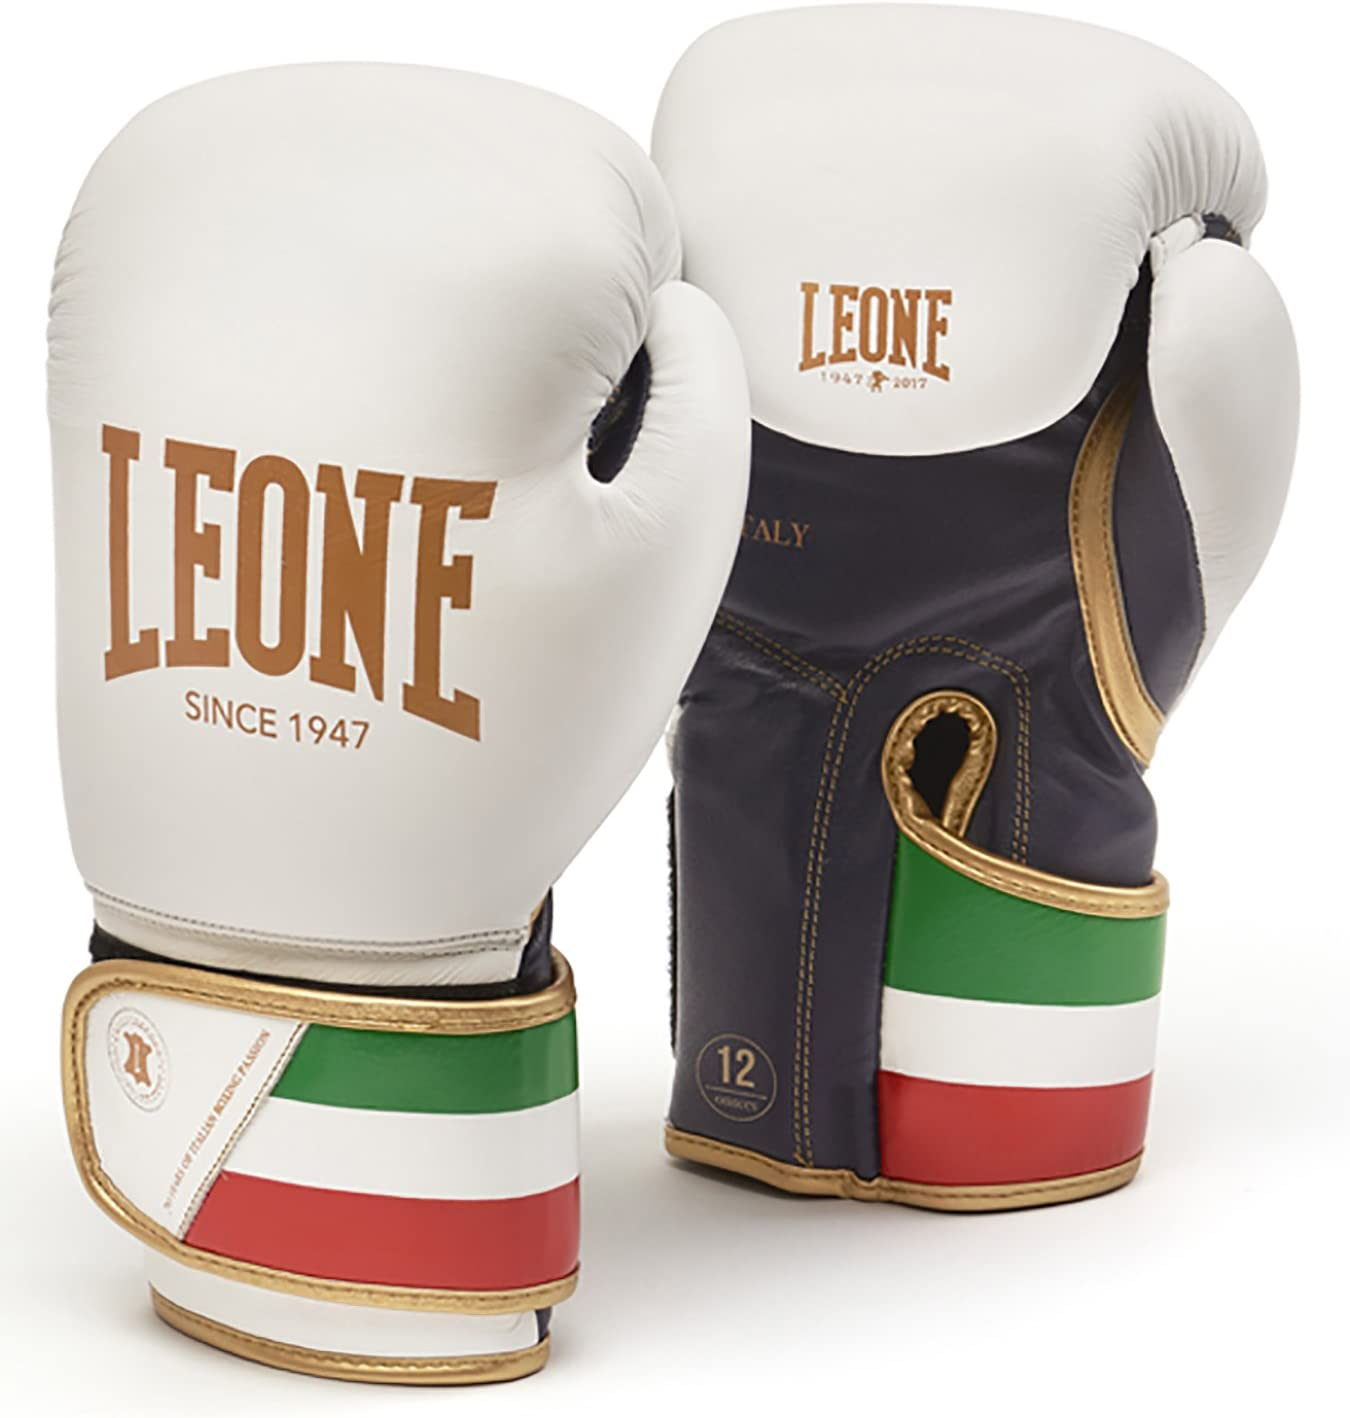 LEONE 1947/GN039 Gloves Boxing Adult Unisex GN039 unisex adult